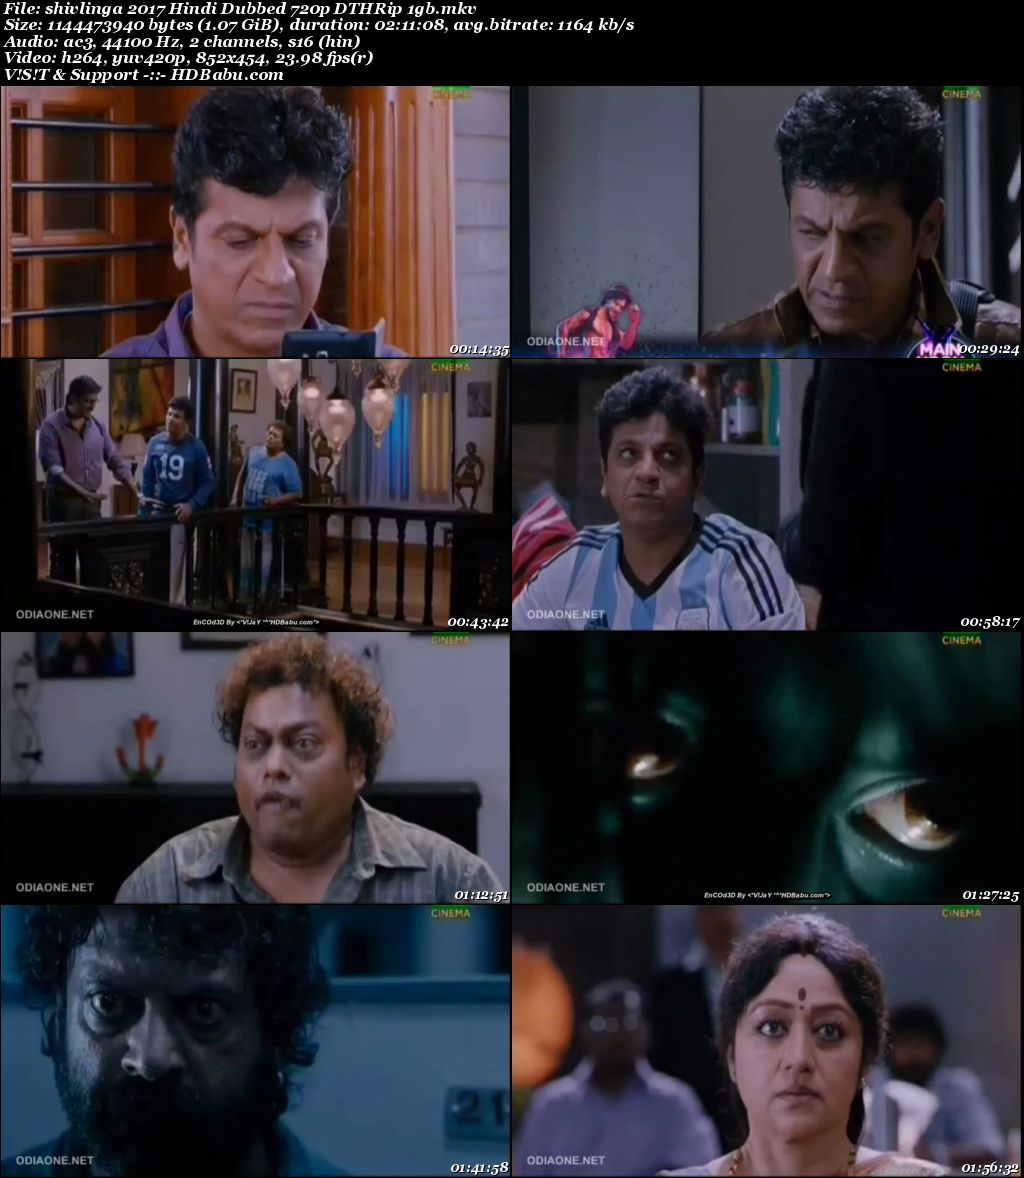 Shivlinga (2017) Hindi Dubbed 720p HDRip Full Movie Download, HShivlinga Hindi Dubbed full hd Movie Download free torrent download, watch online